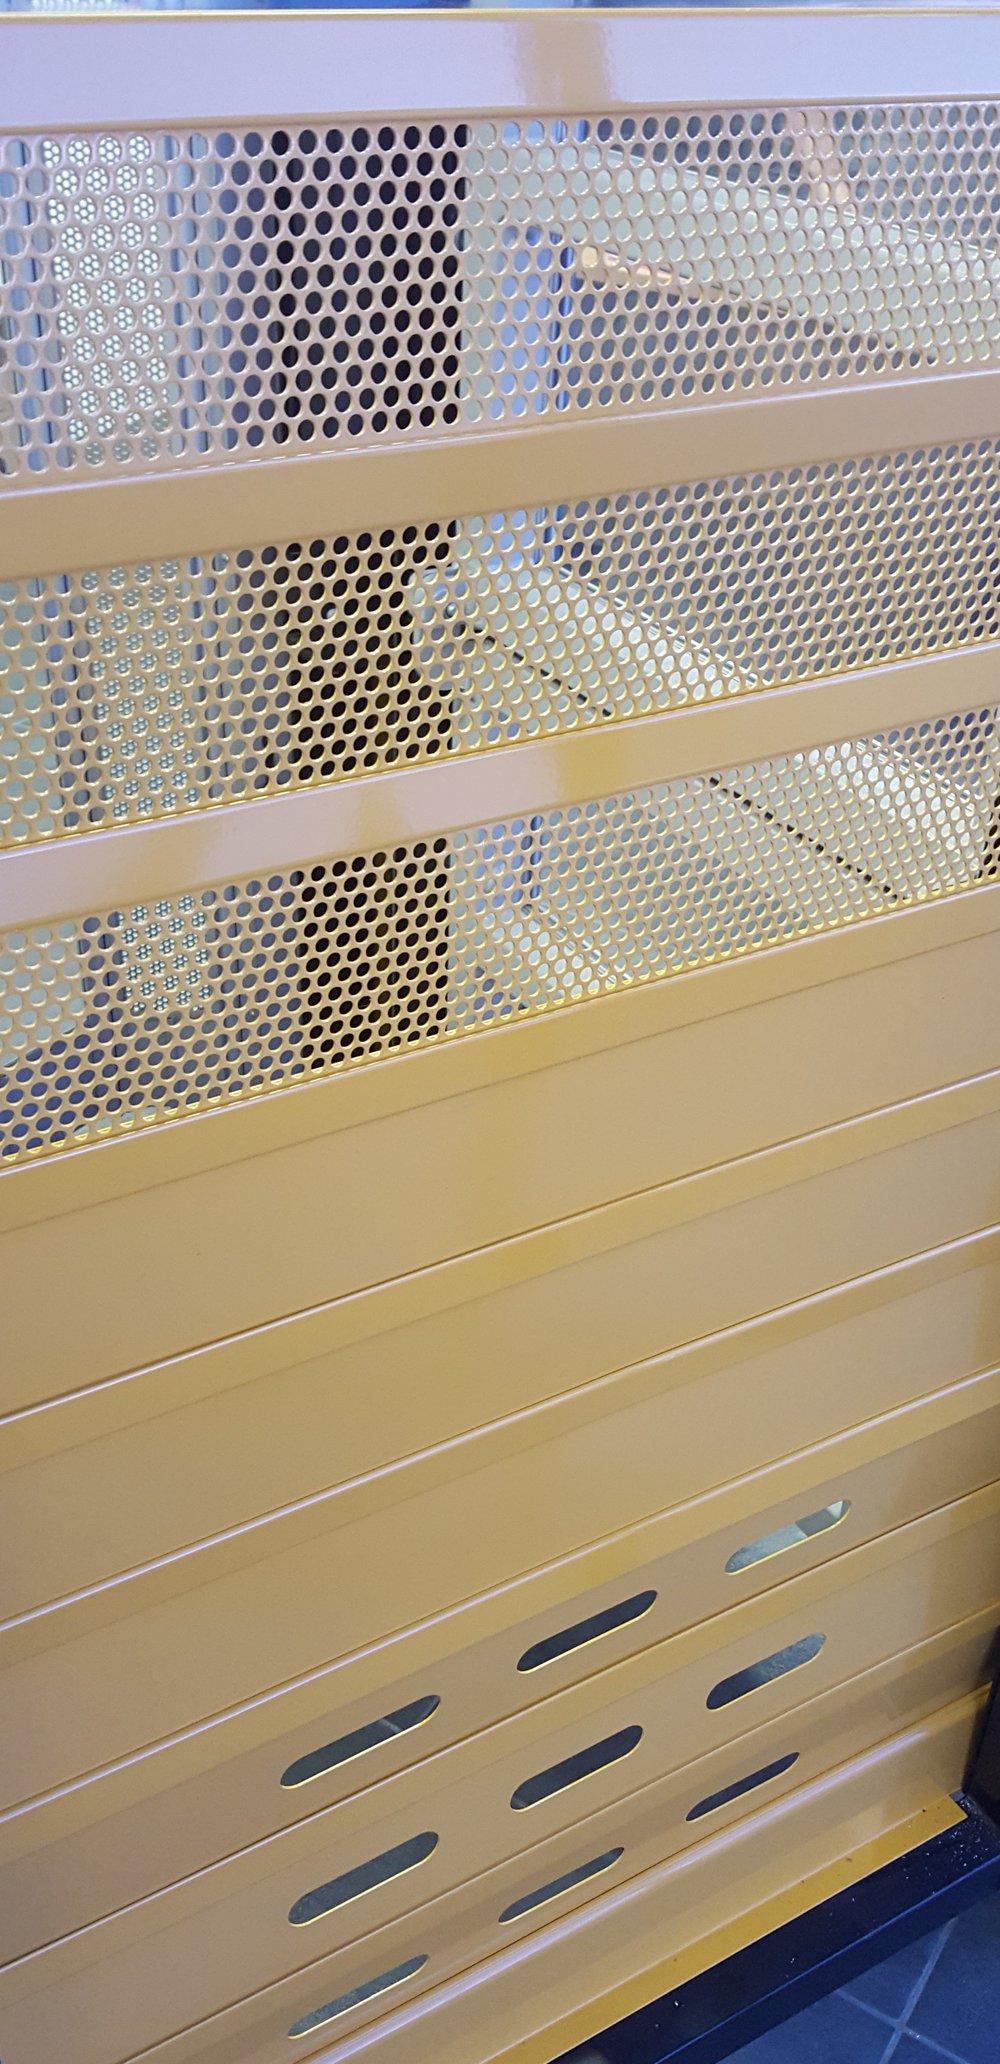 Different steel roller shutter slats